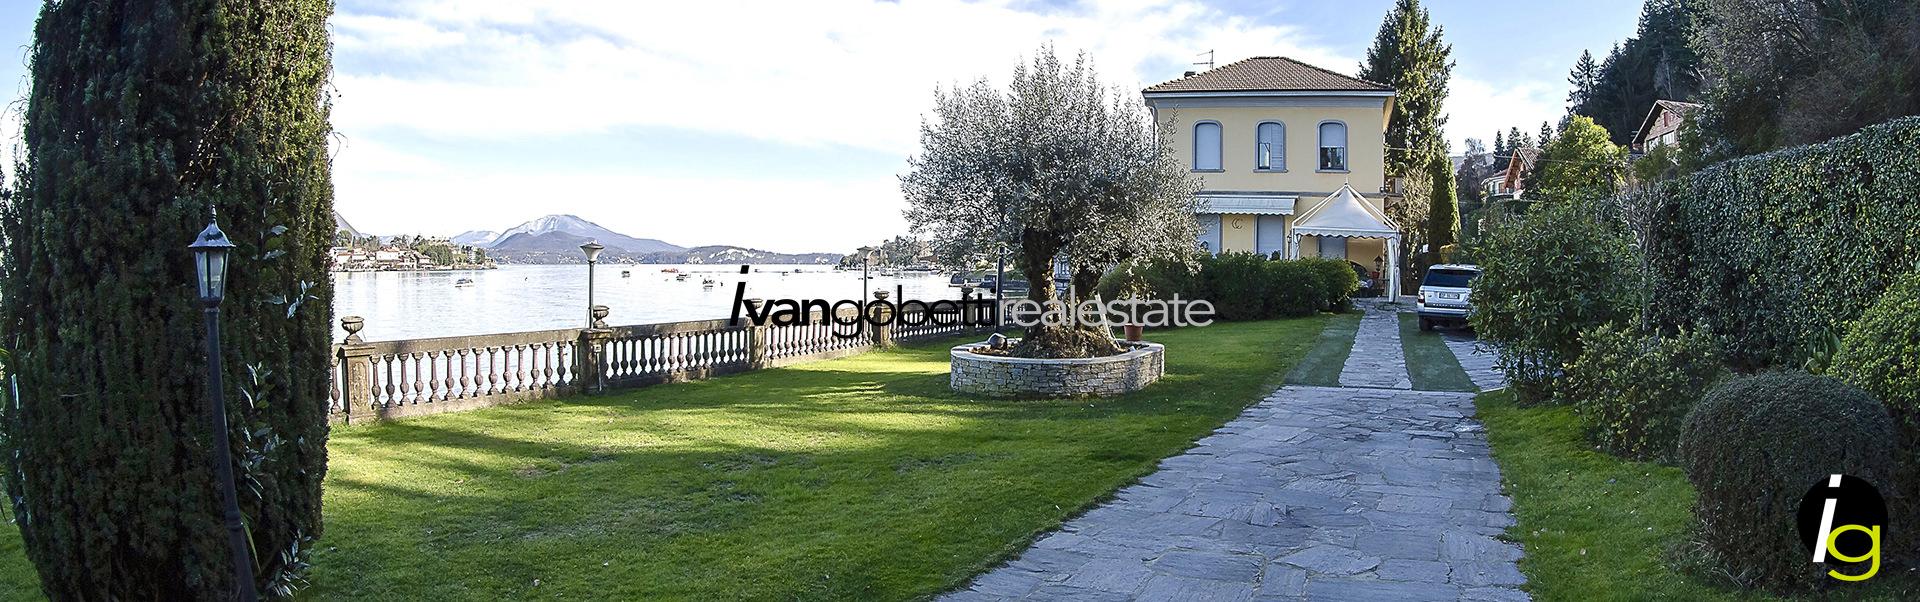 Historicvilladirectlyonthewater, Lake Maggiore, Stresa